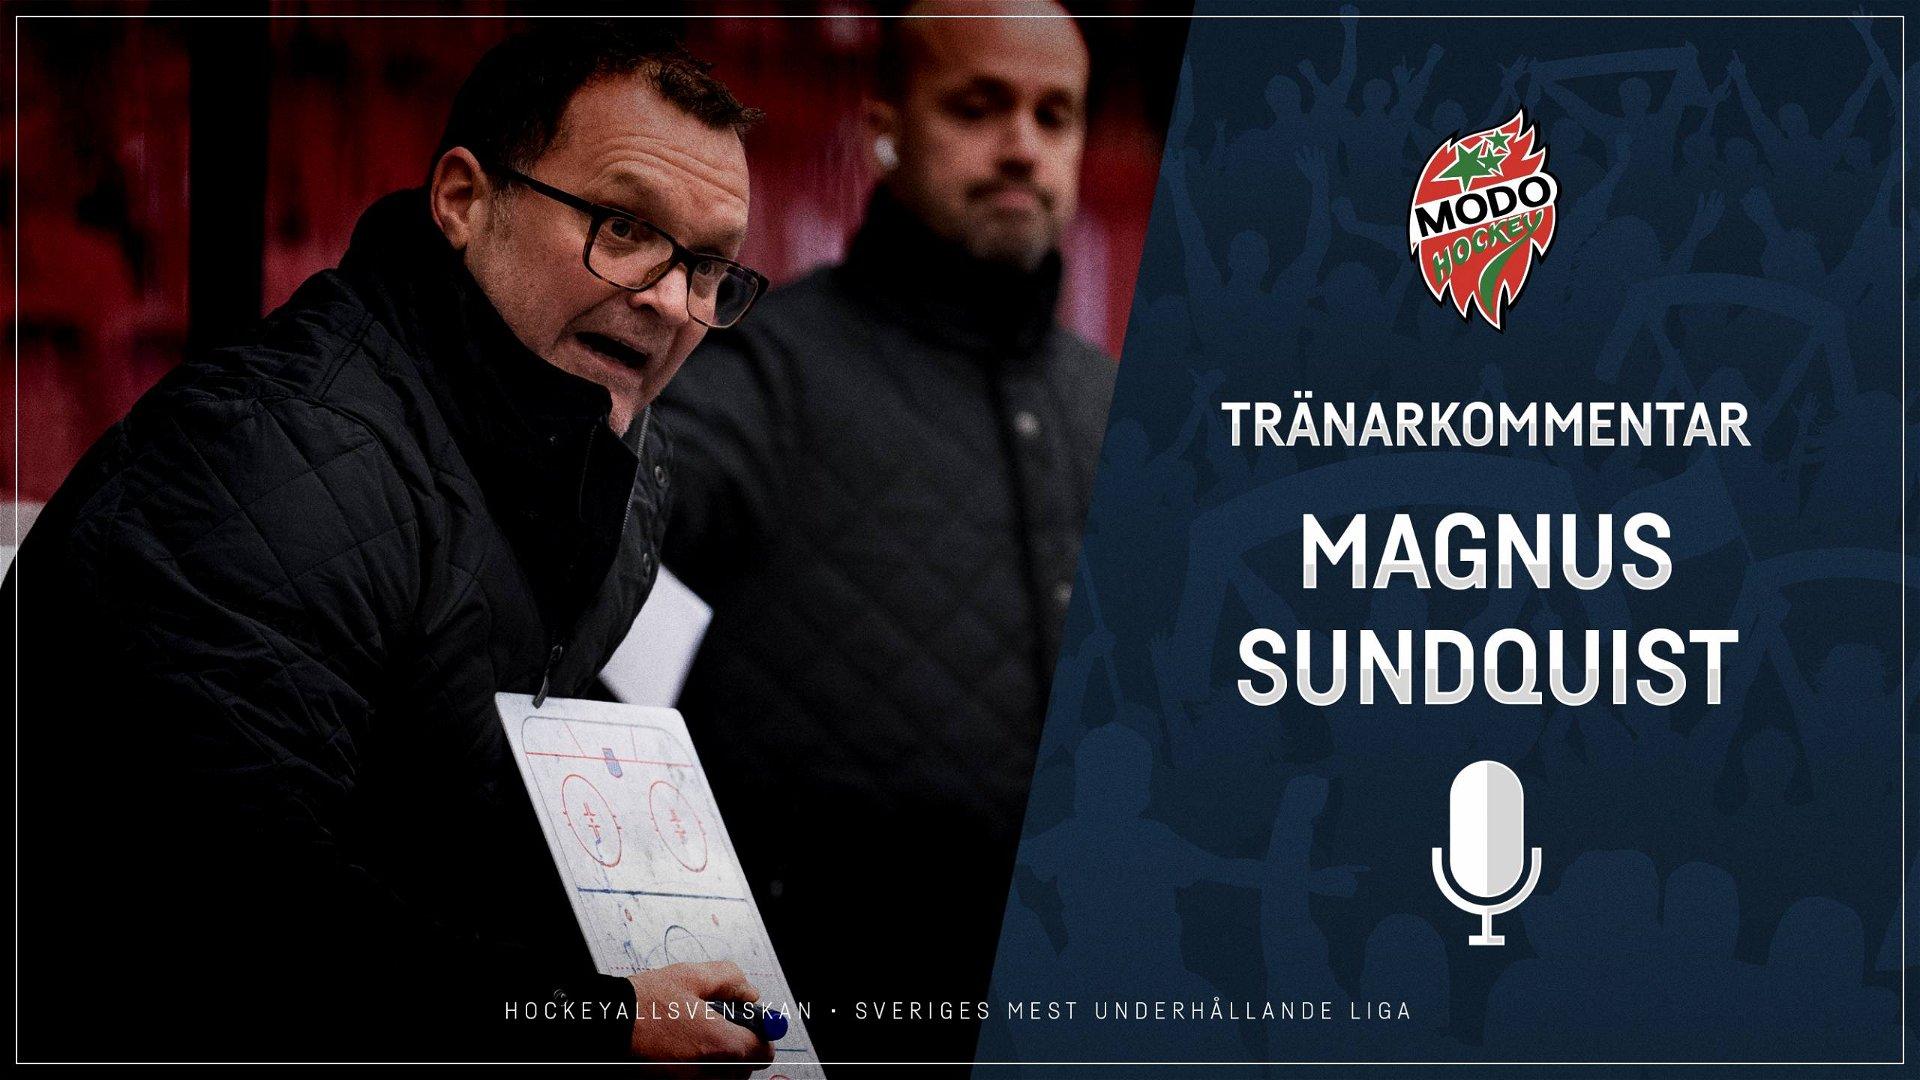 2021-02-20 Segerintervju: Magnus Sundquist